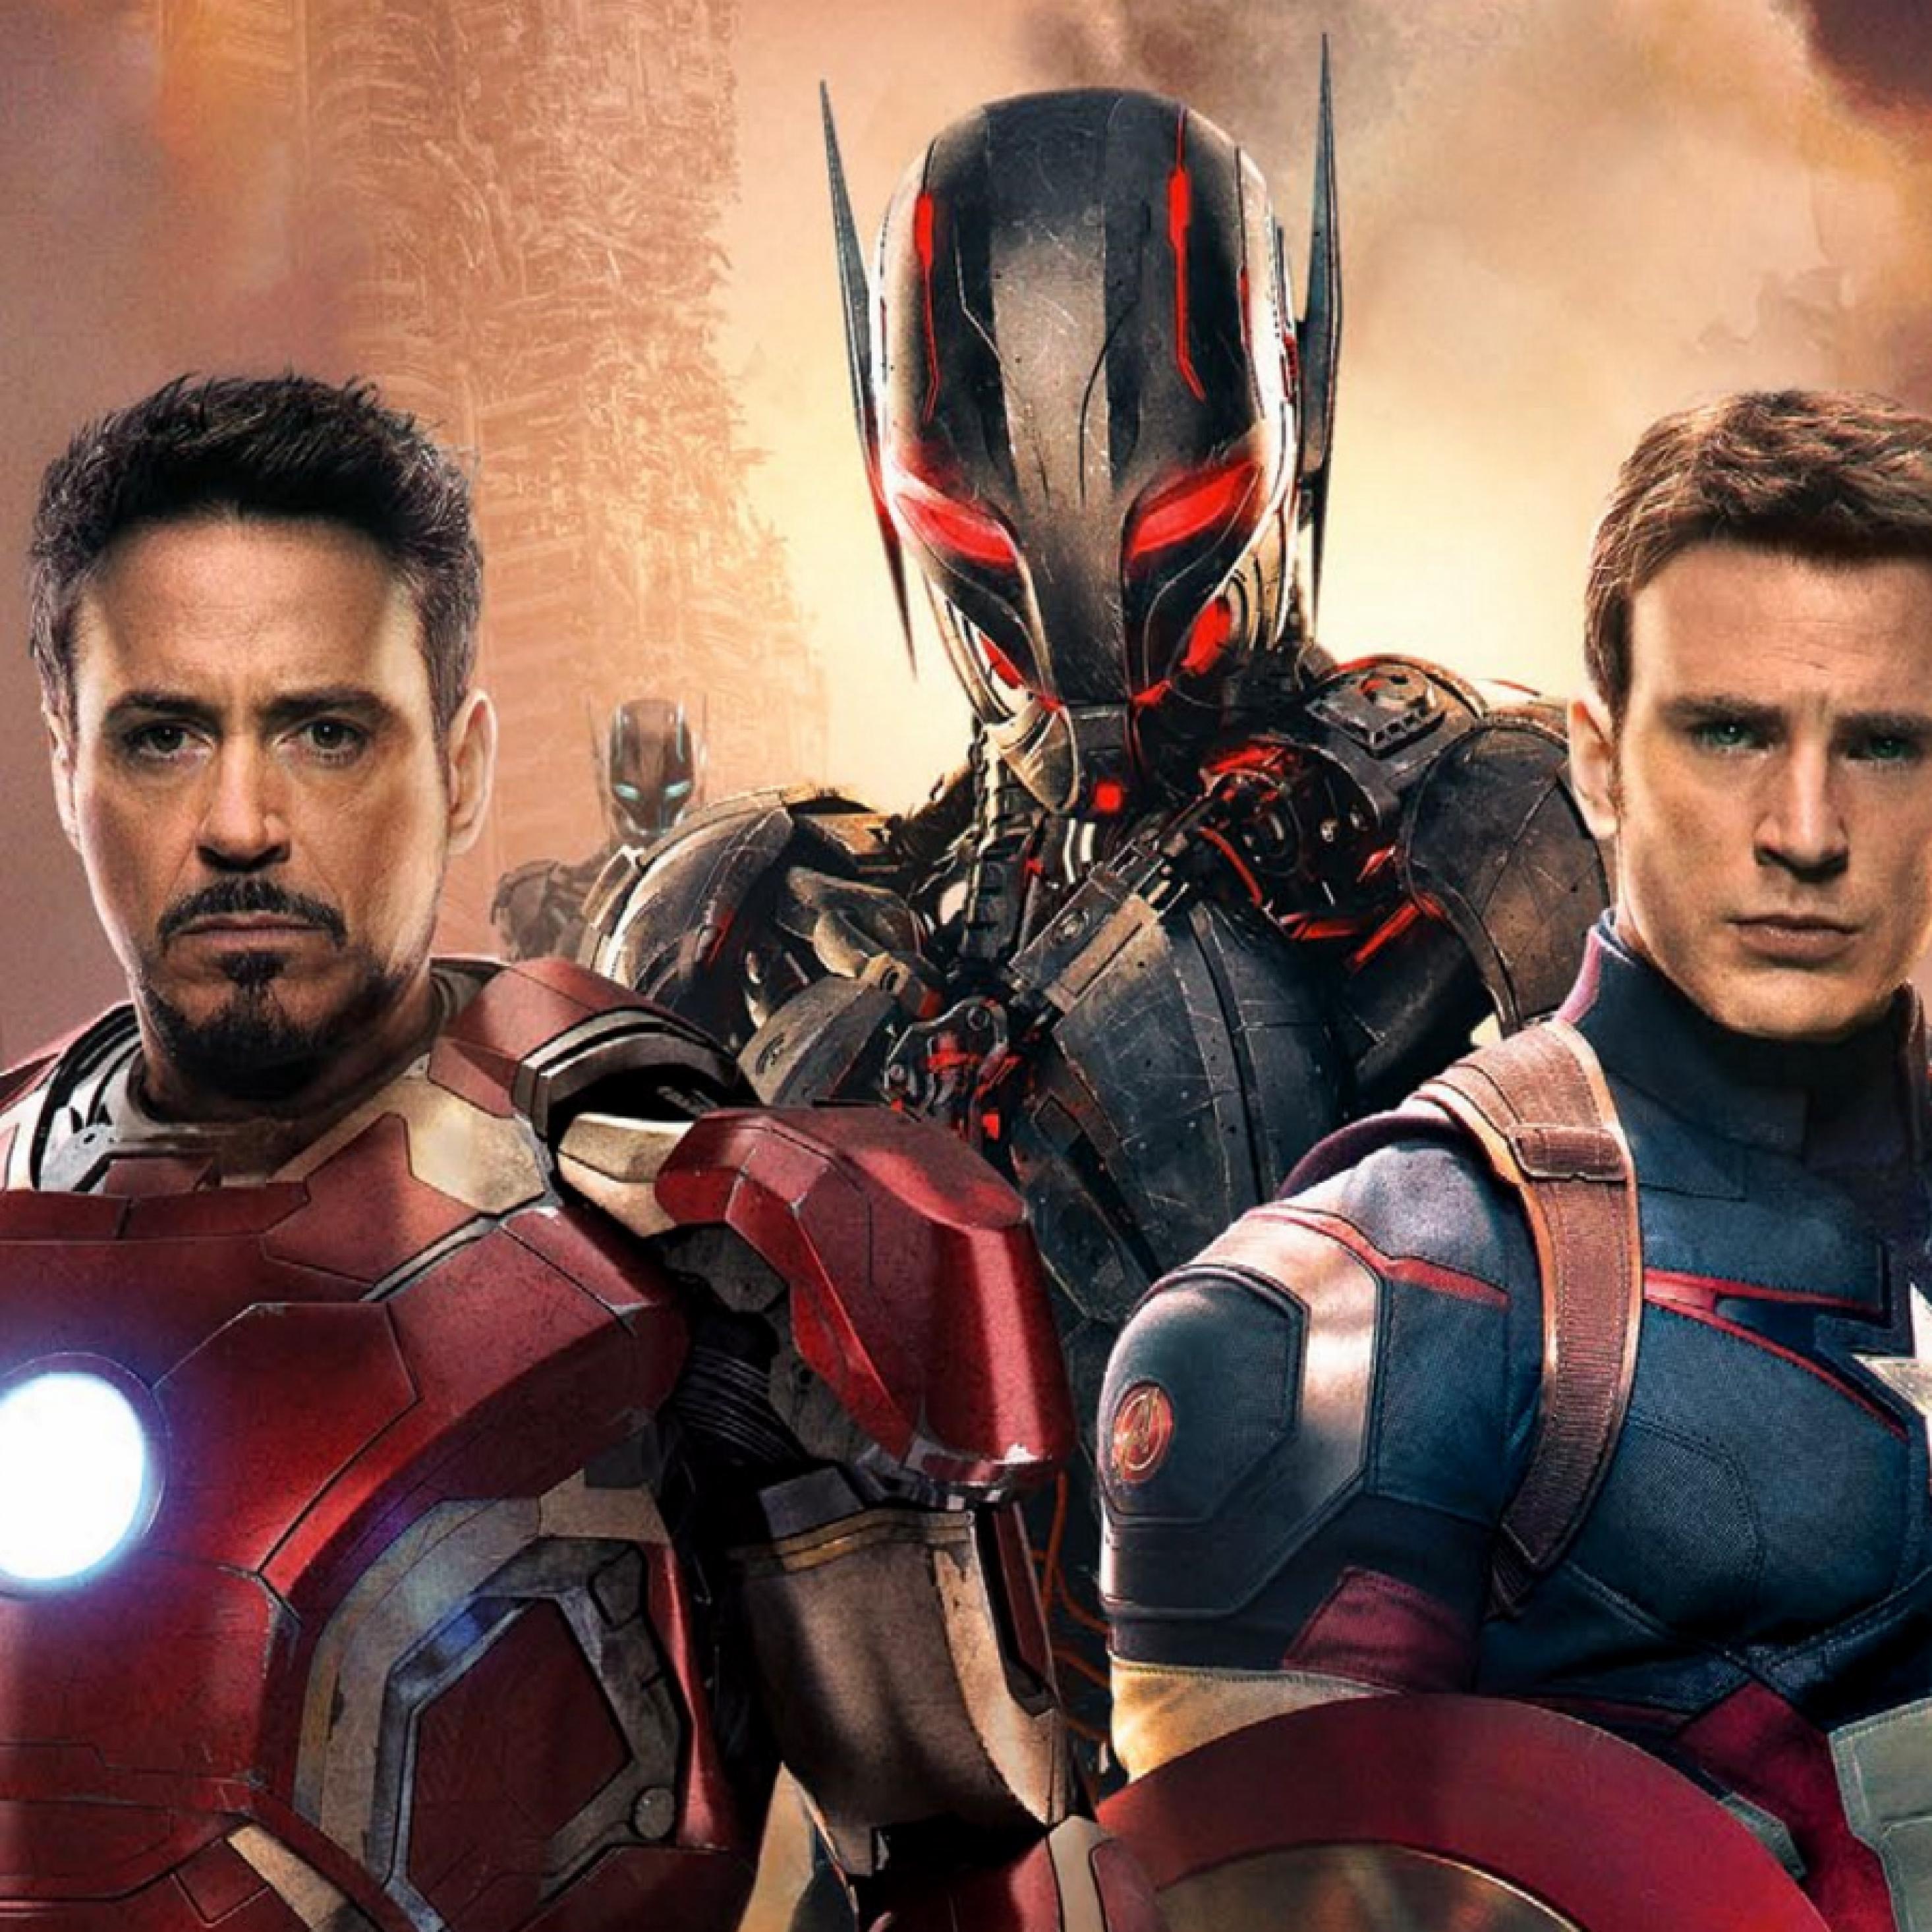 2932x2932 Avengers Age Of Ultron Wallpaper Hd Ipad Pro Retina